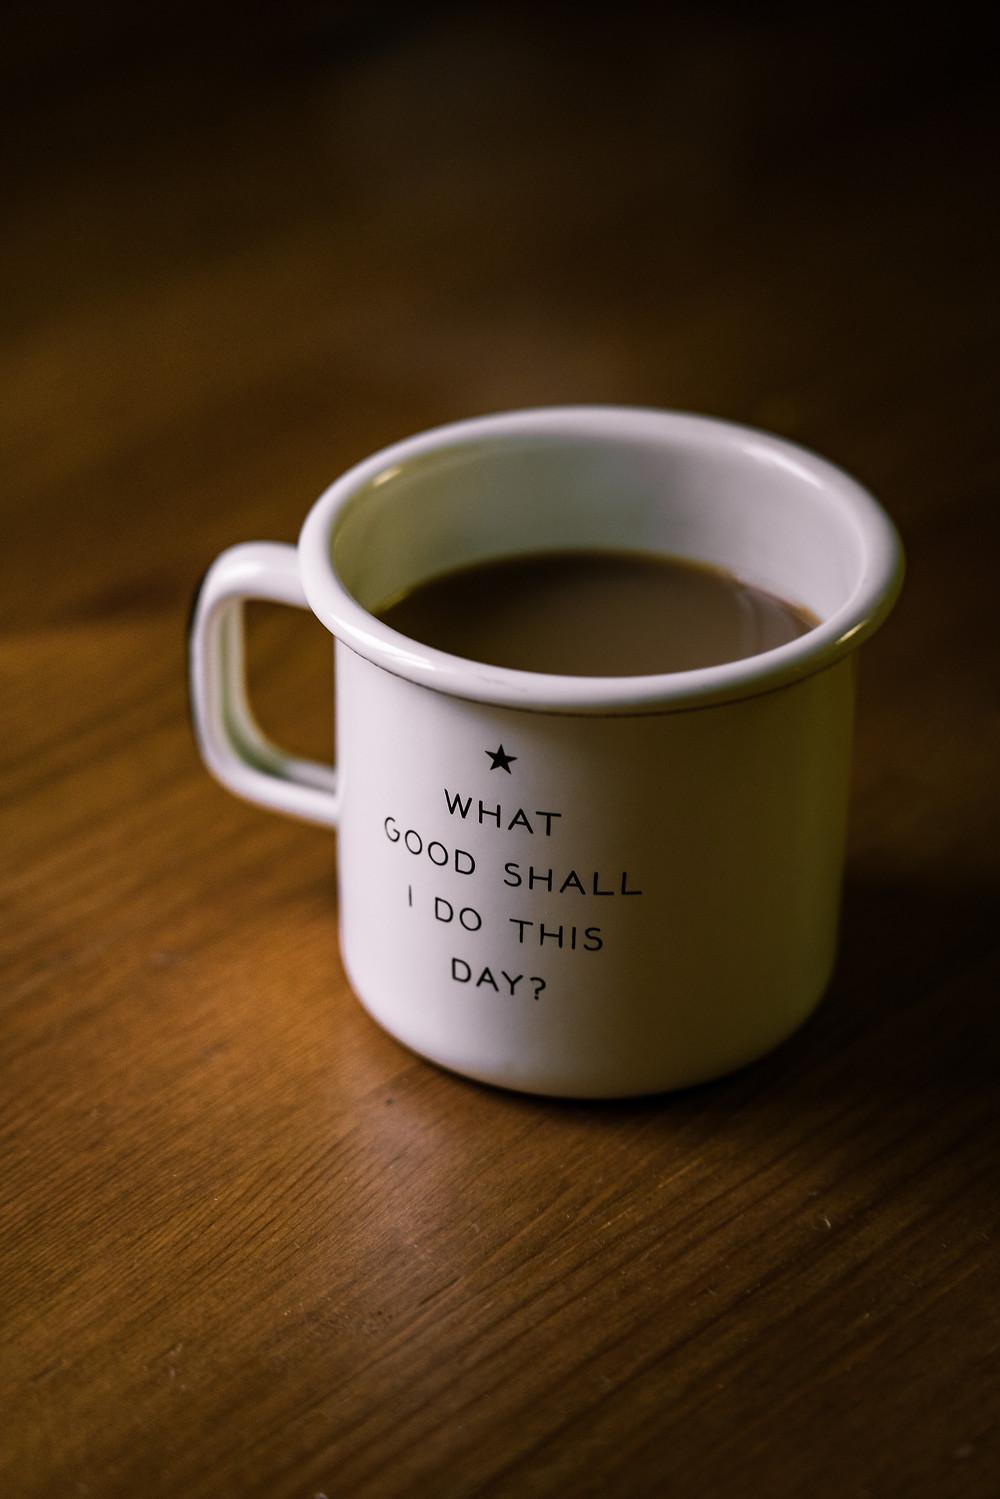 Coffee mug, Do good, Quote, Yoga, Ahimsa, Nonviolence, Volunteering, Selfless service, Bhakti Yoga